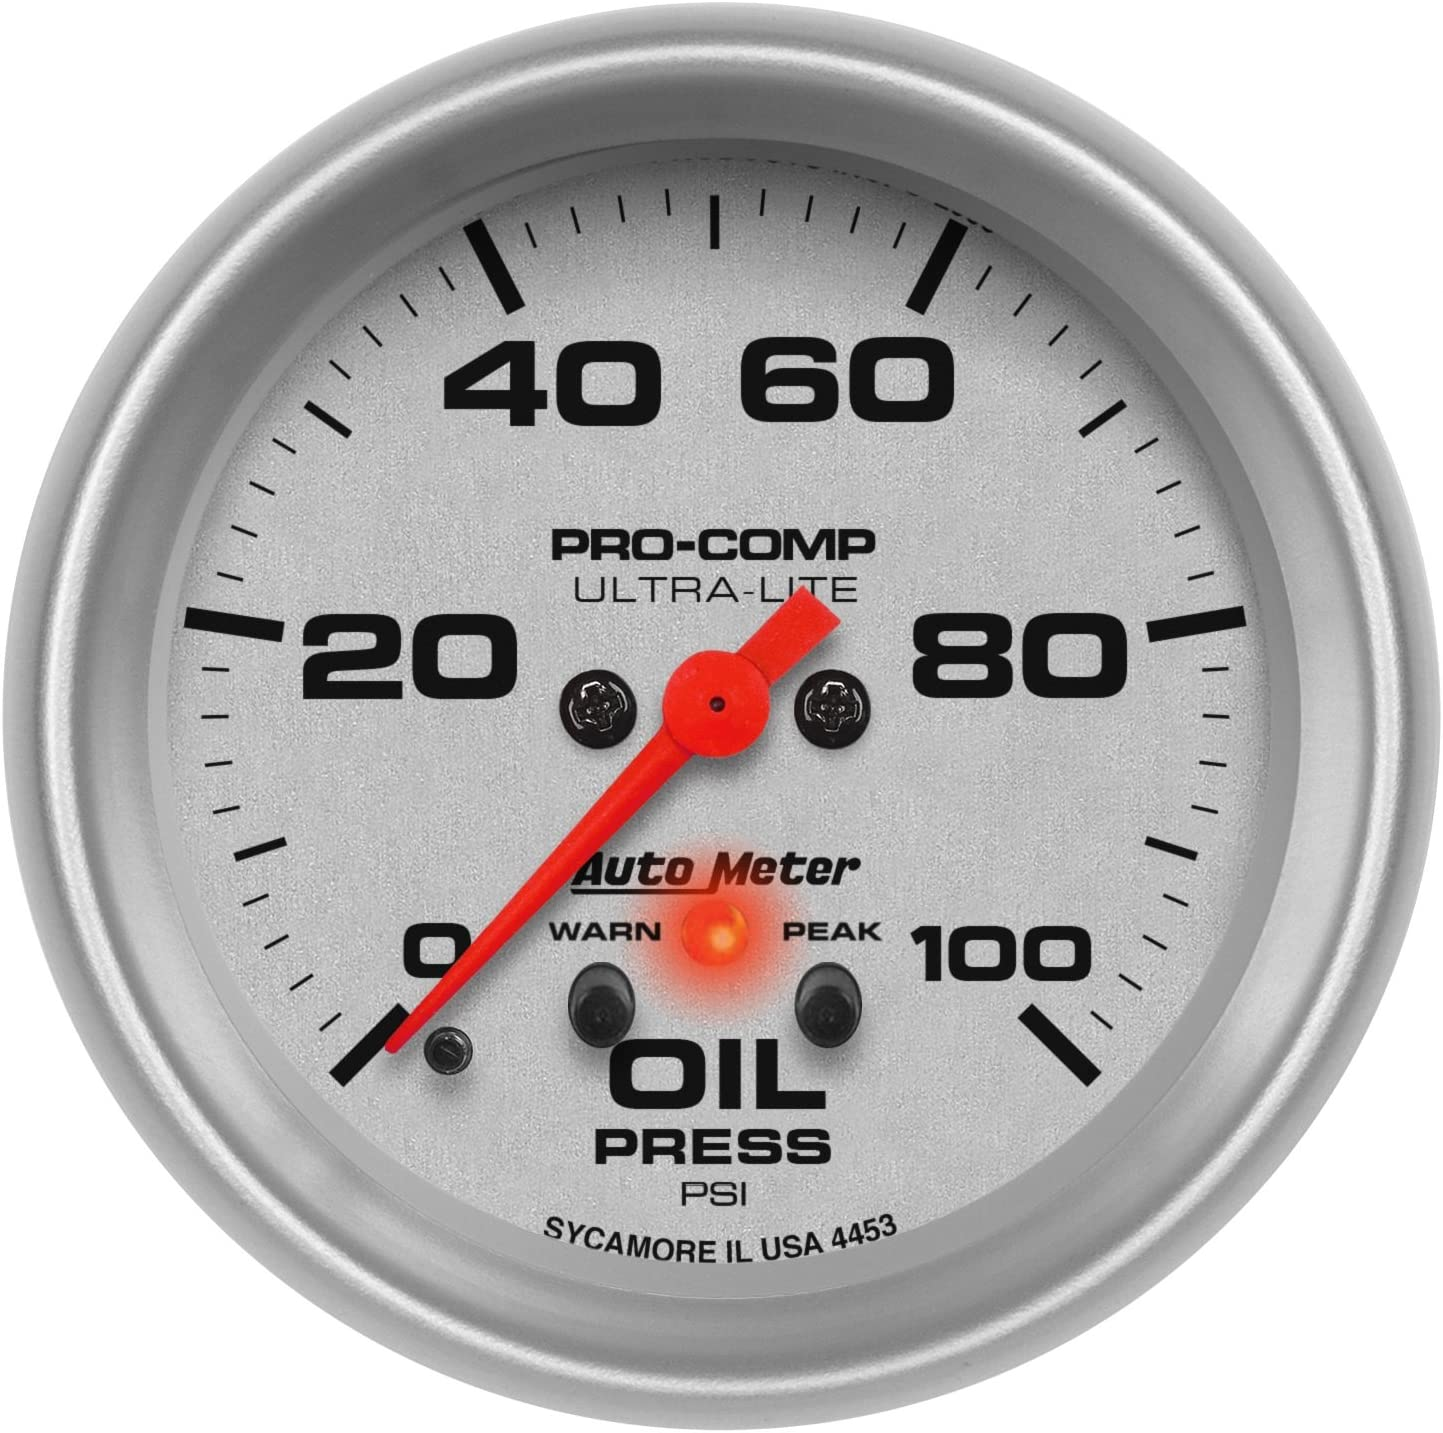 Auto Meter 4310 Ultra-Lite Electric Programmable Fuel Level Gauge